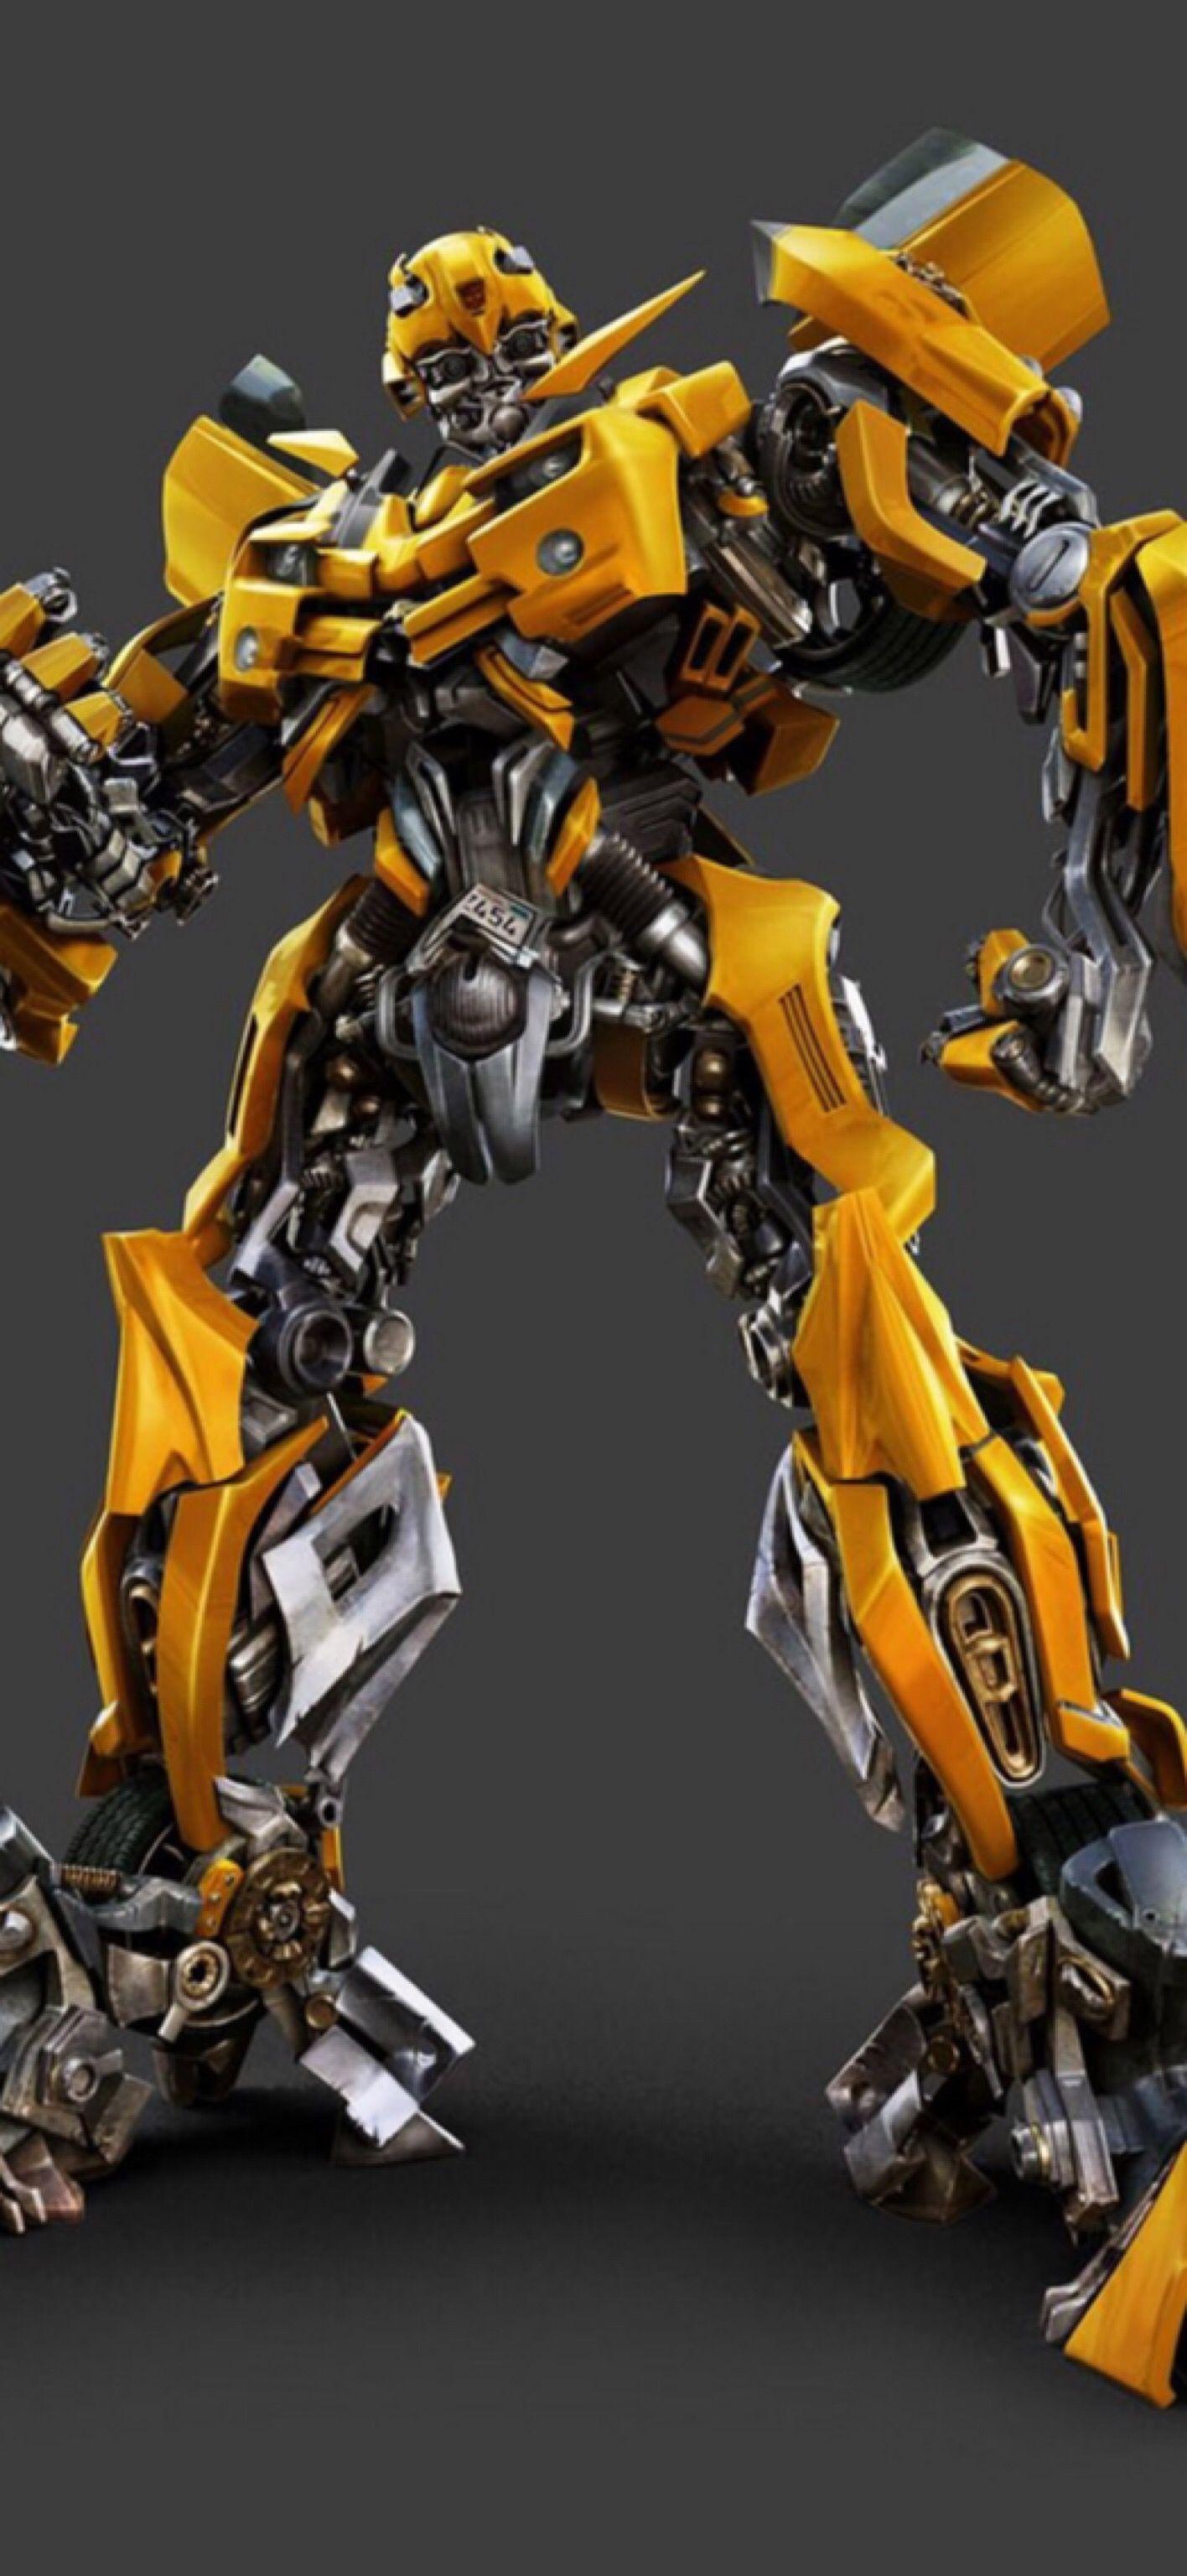 1000+ Wallpaper Hd Android Bumblebee HD